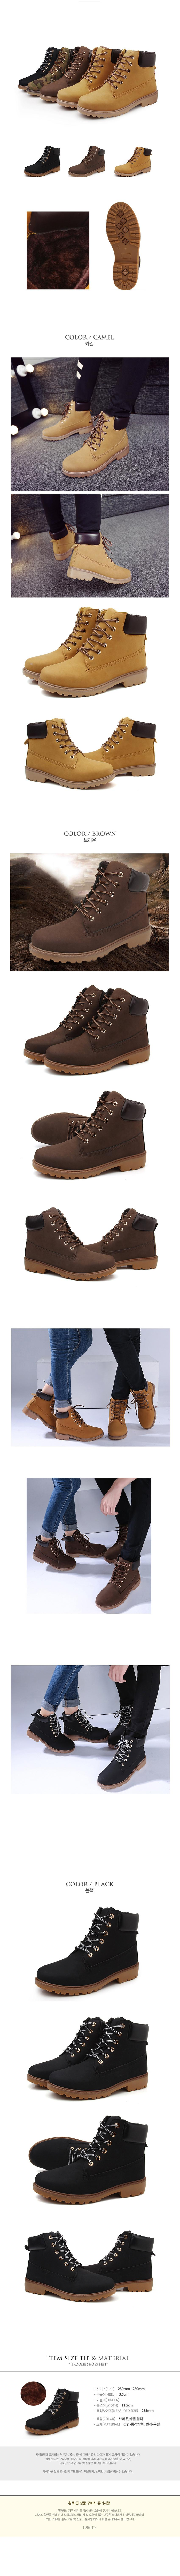 Warm-up couple walker shoes